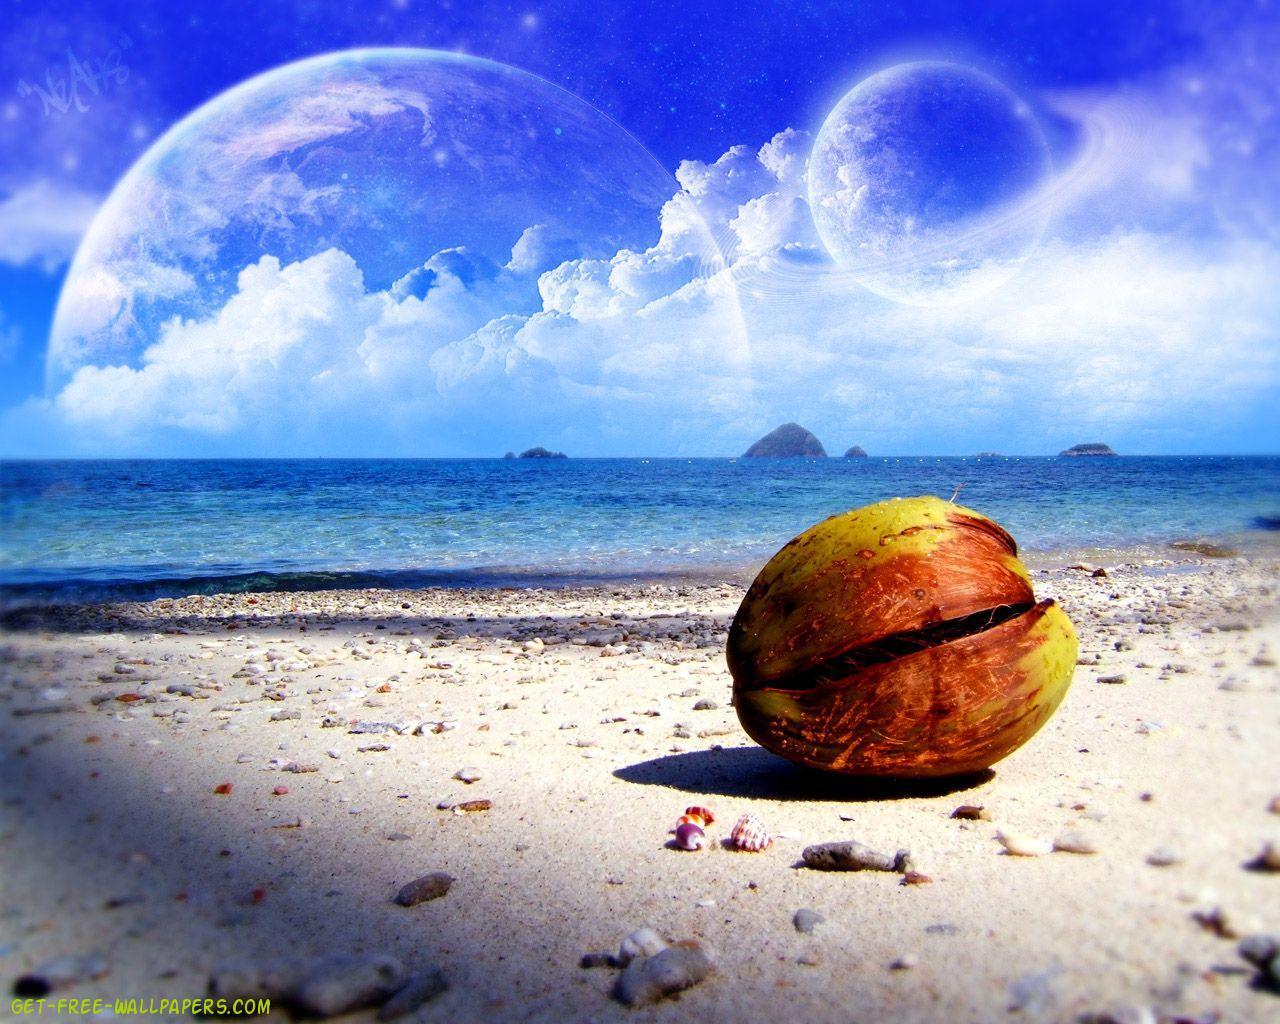 Beach-Fantasy-Art-–-Dreams-Of-A-Fantasy-World-We-View-Image-wallpaper-wpc5802588